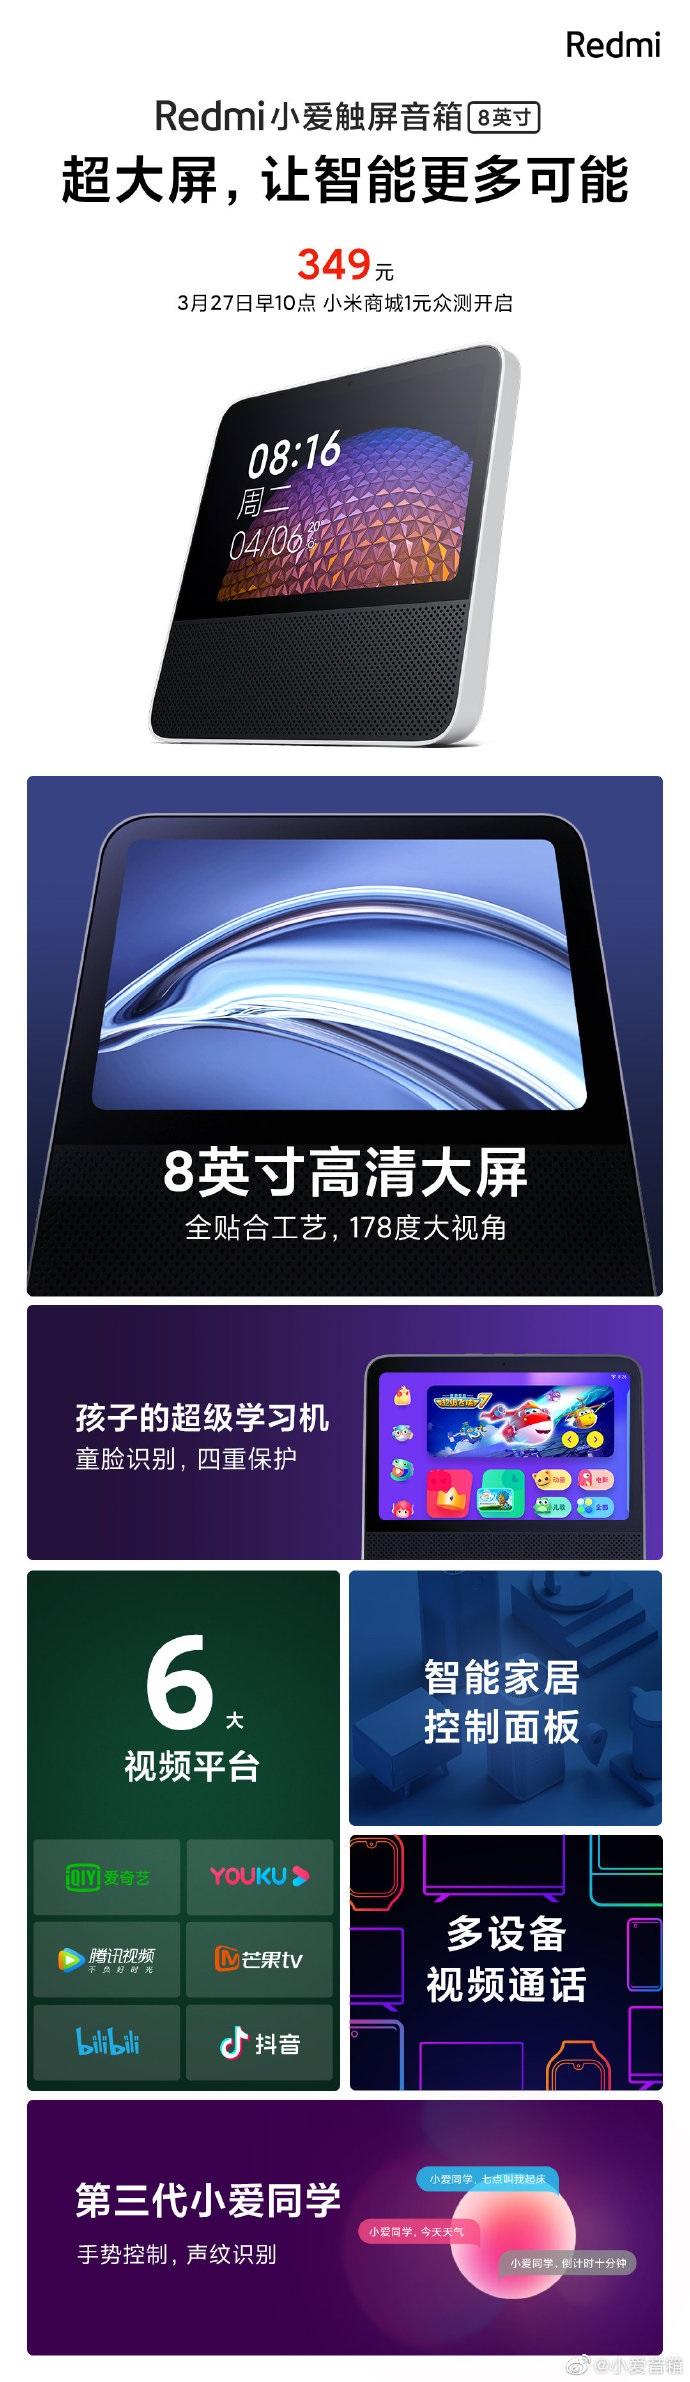 Redmi Xiaoai touch screen speaker